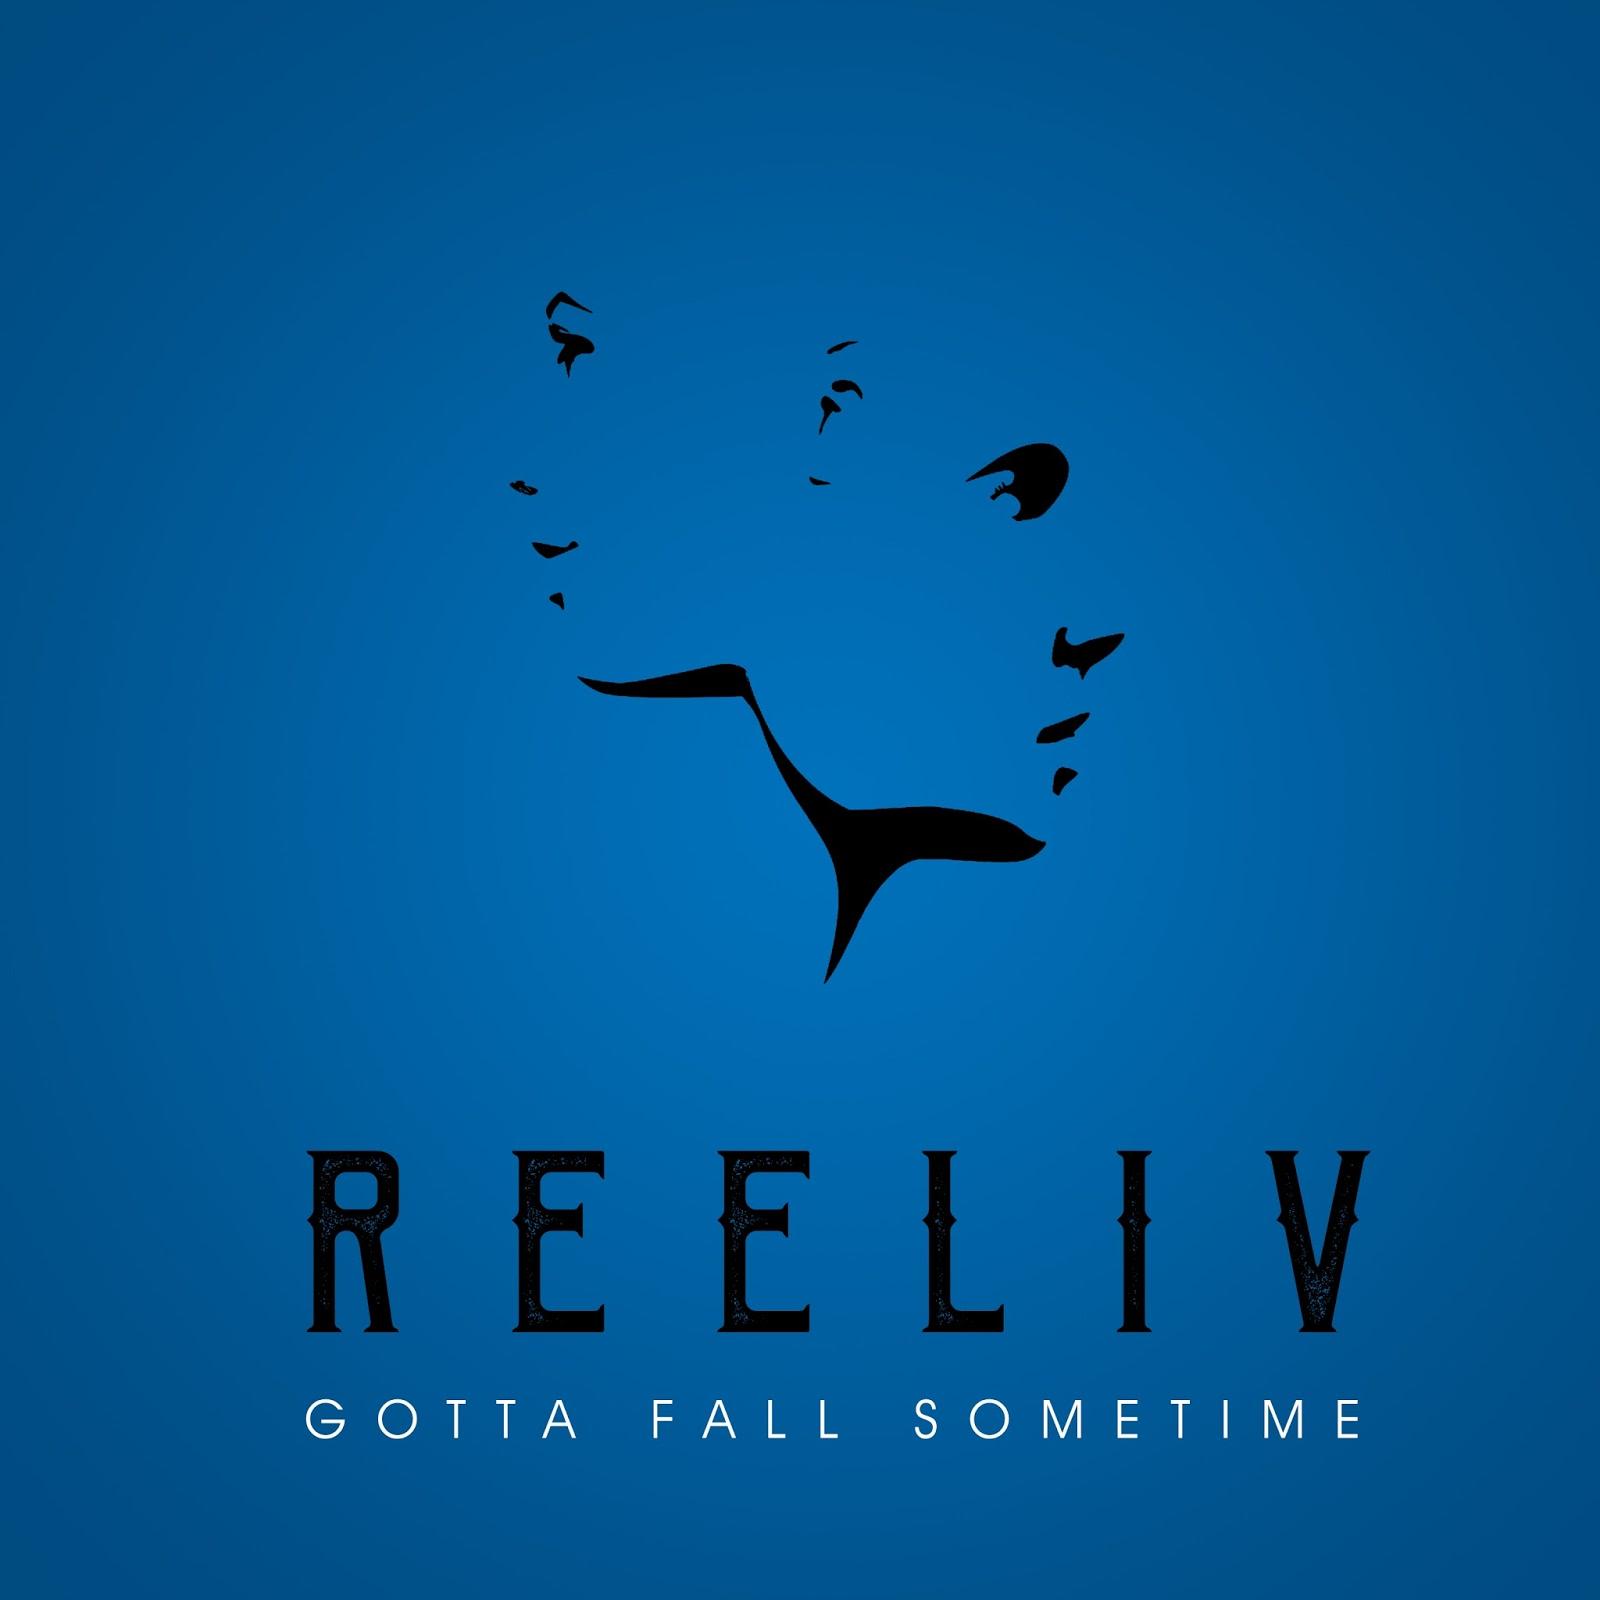 Reeliv lyric video gotta fall sometime matterz reeliv lyric video gotta fall sometime stopboris Images